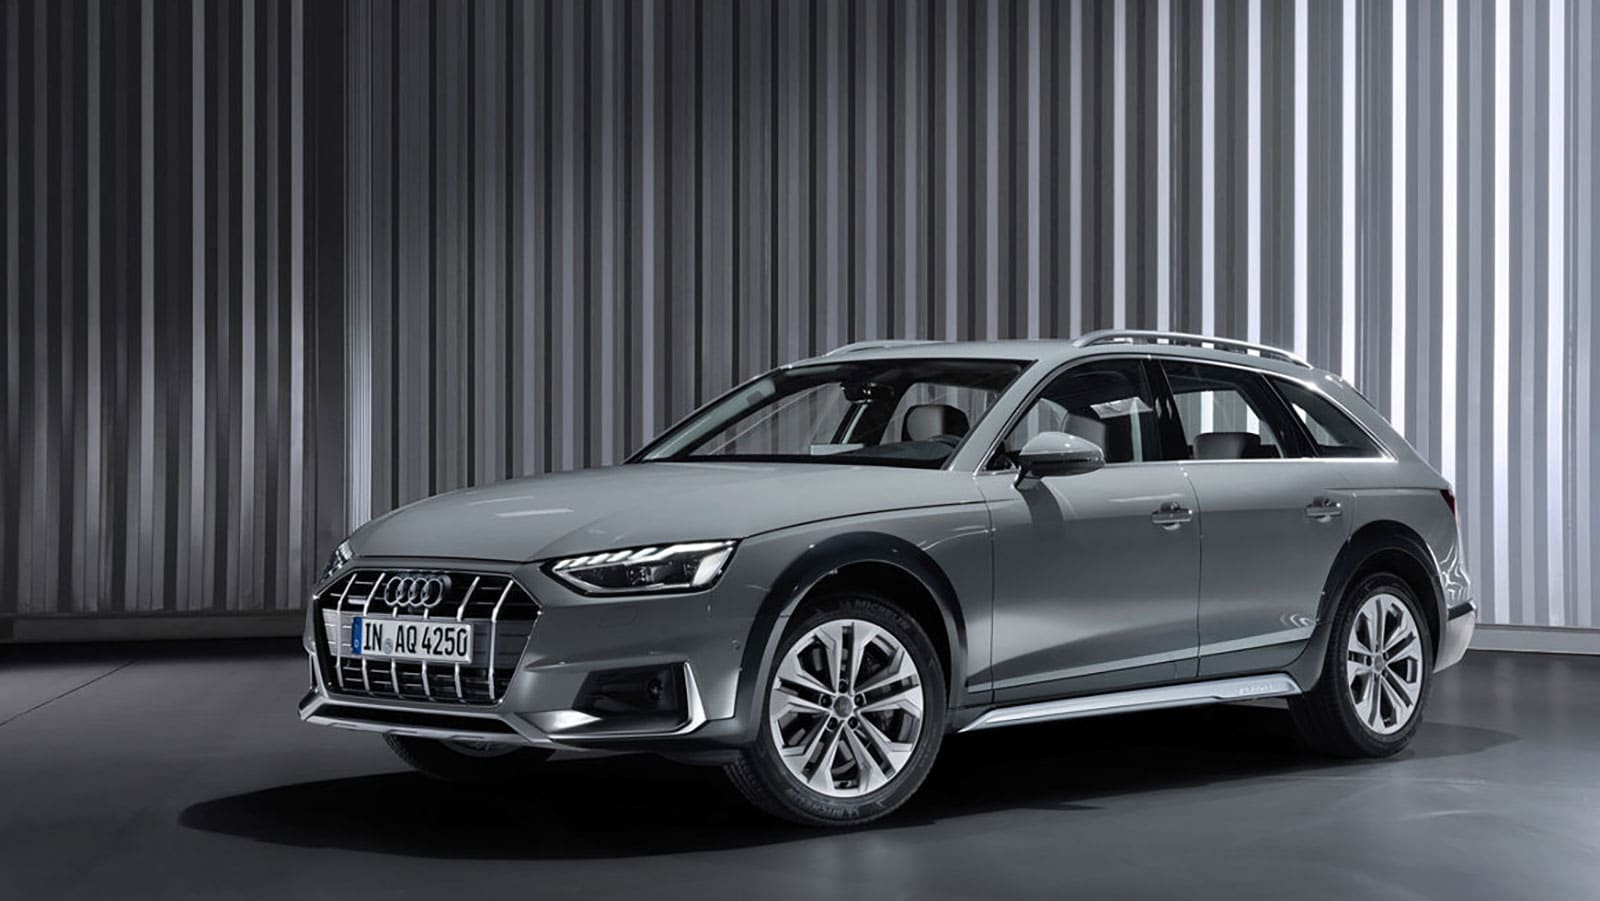 2021 Audi Allroad Exterior and Interior